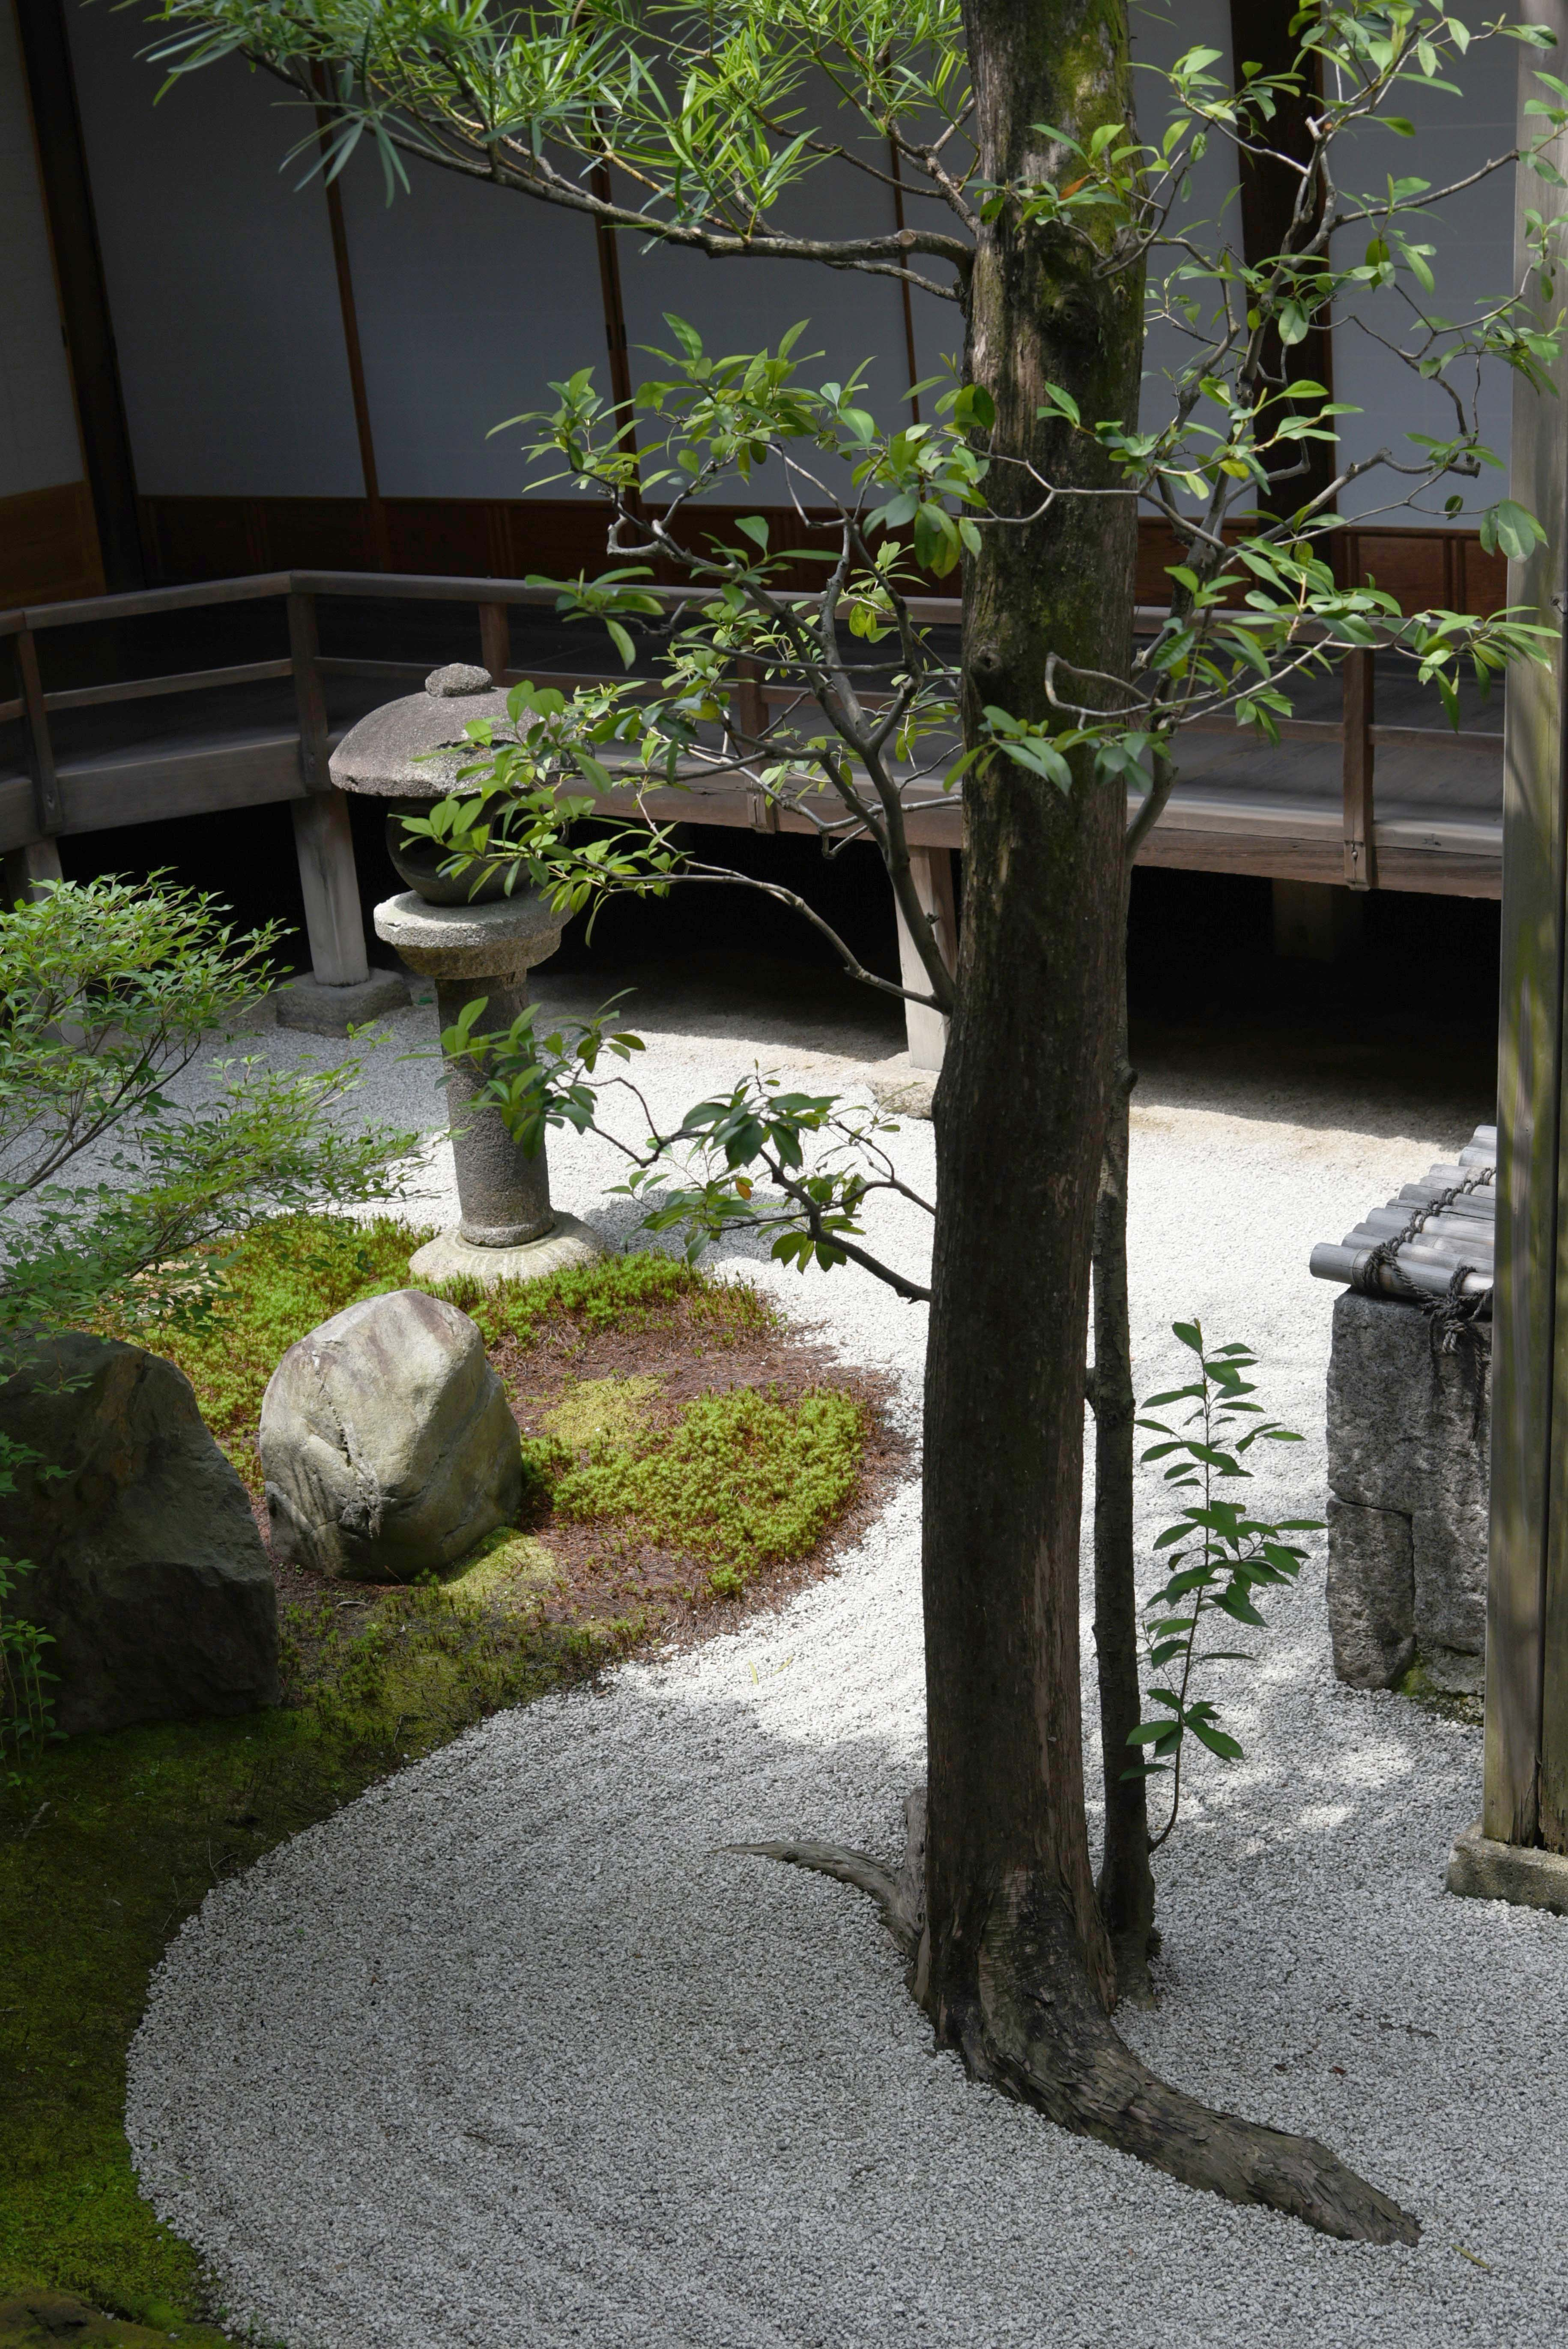 京都 両足院 半夏生の庭 2019 Wakasa15thfd